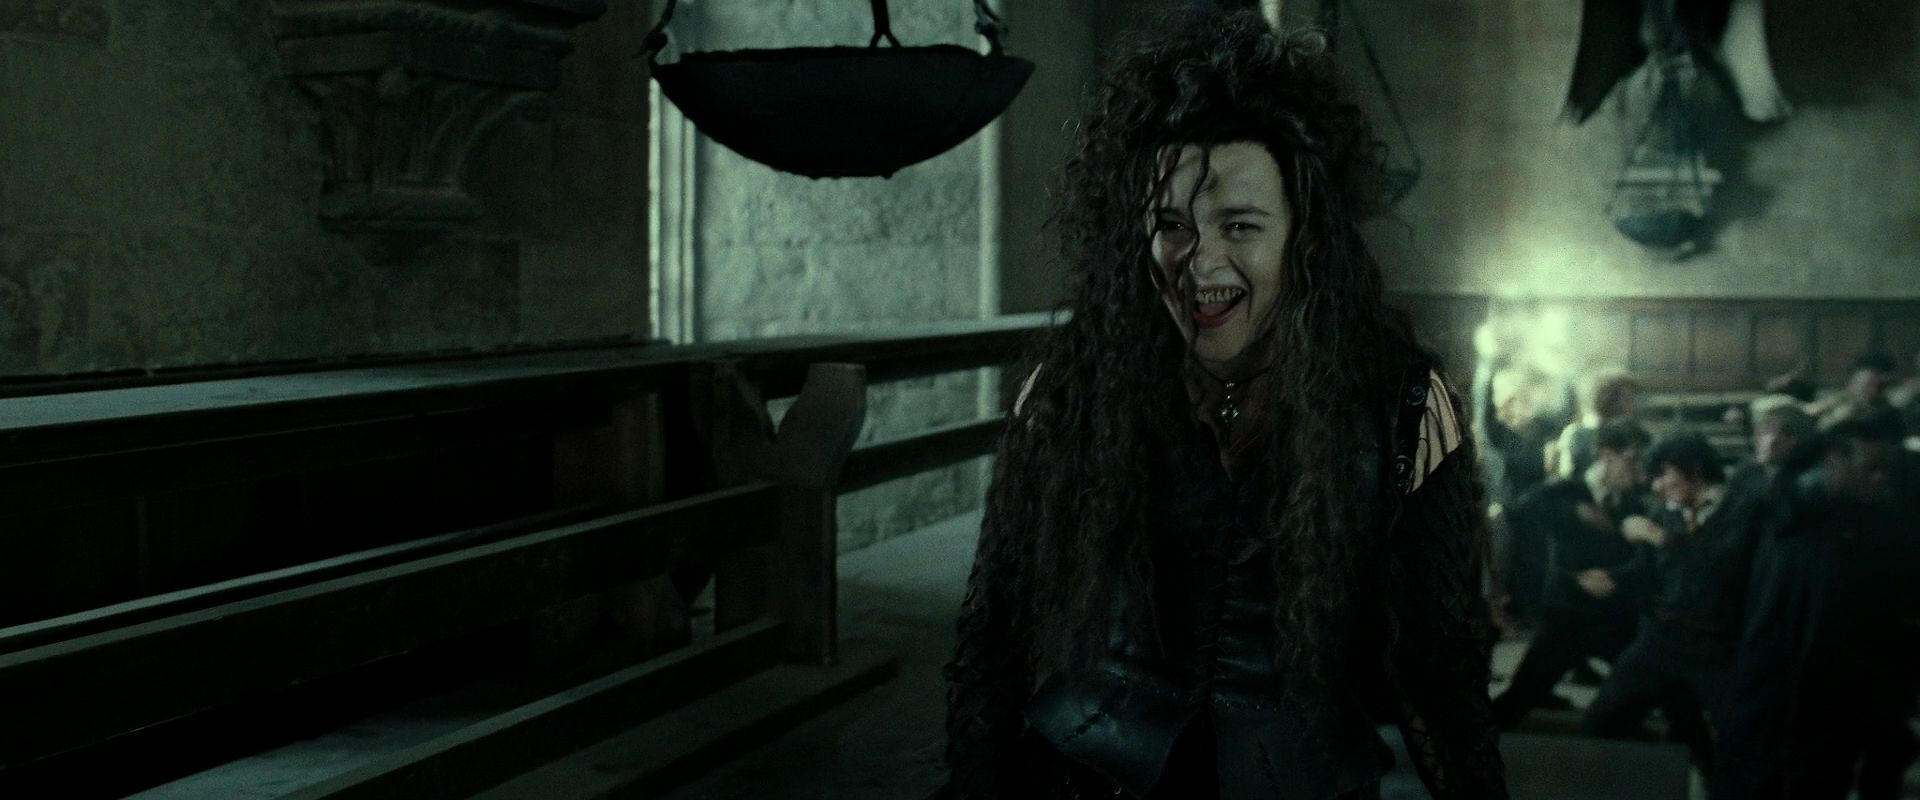 Bellatrix lestrange potter harry